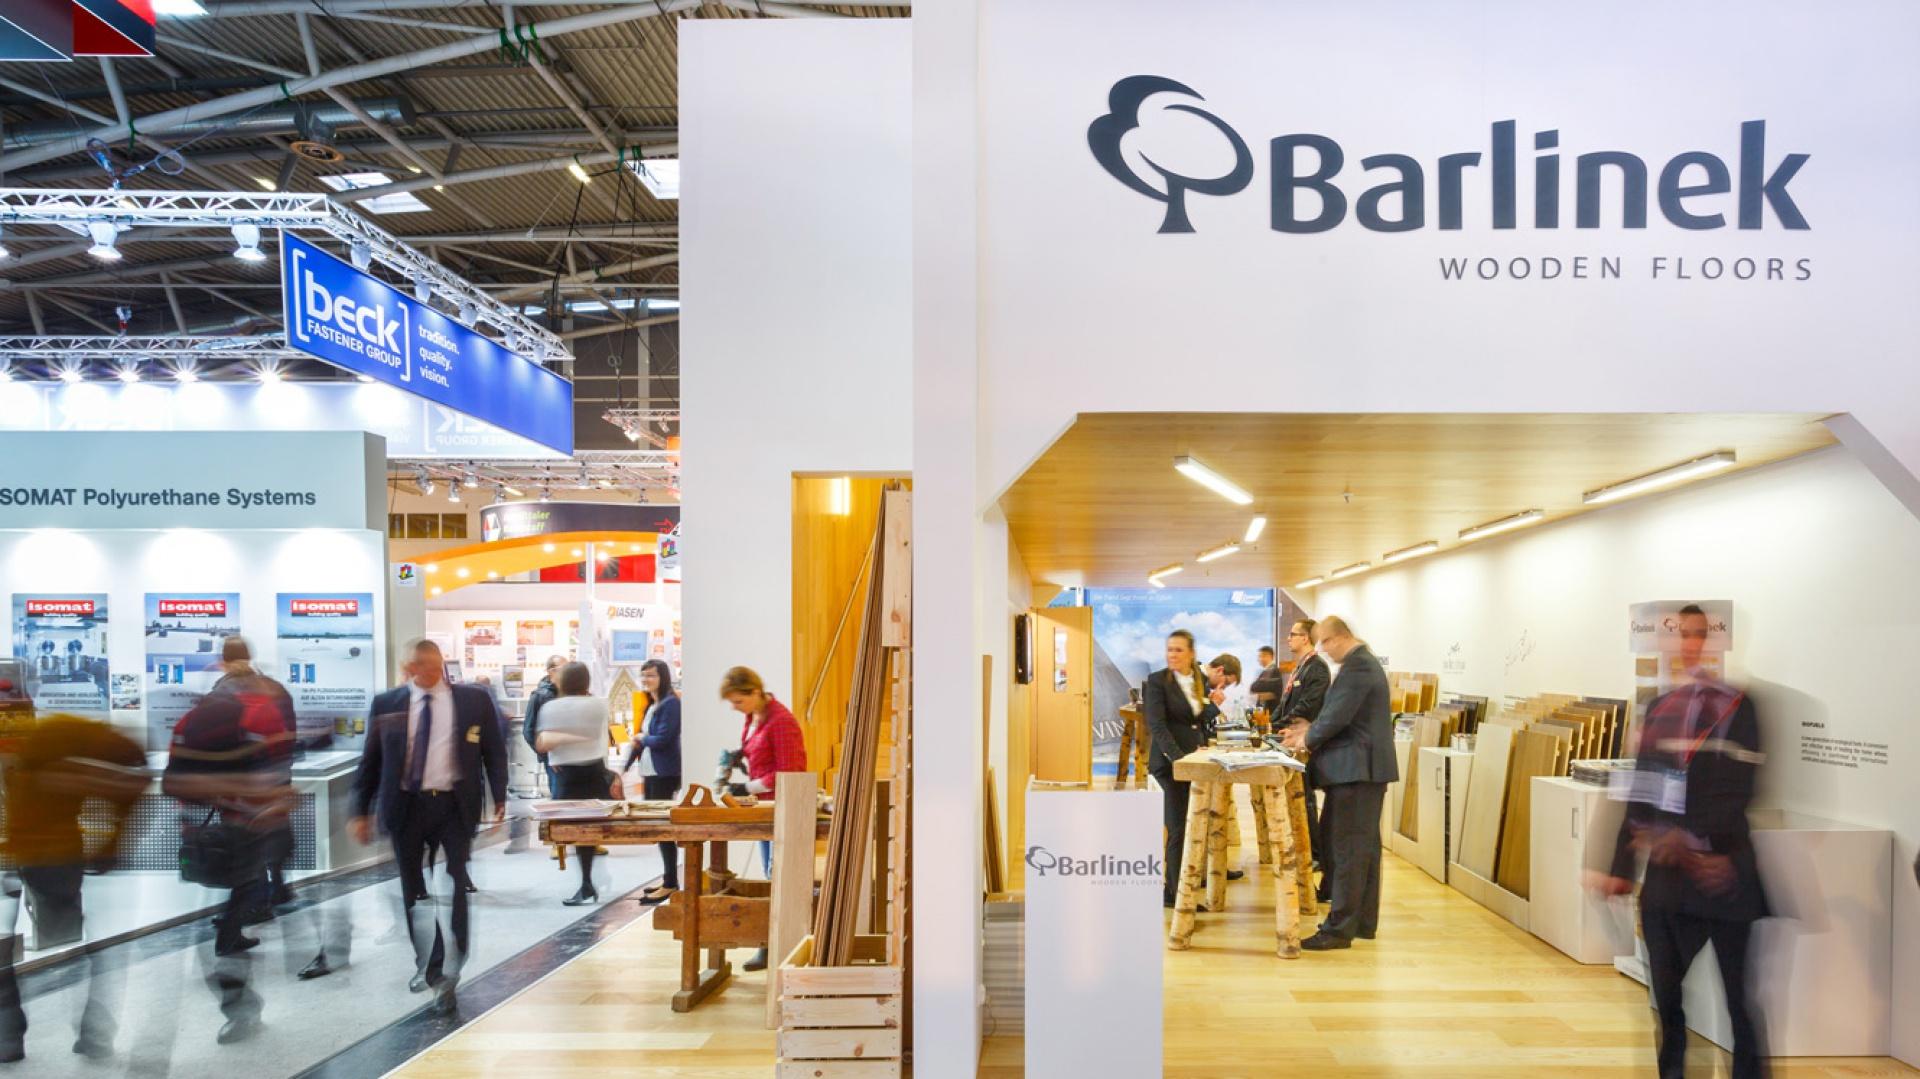 Stoisko firmy Barlinek na monachijskich targach BAU. Fot. Barlinek